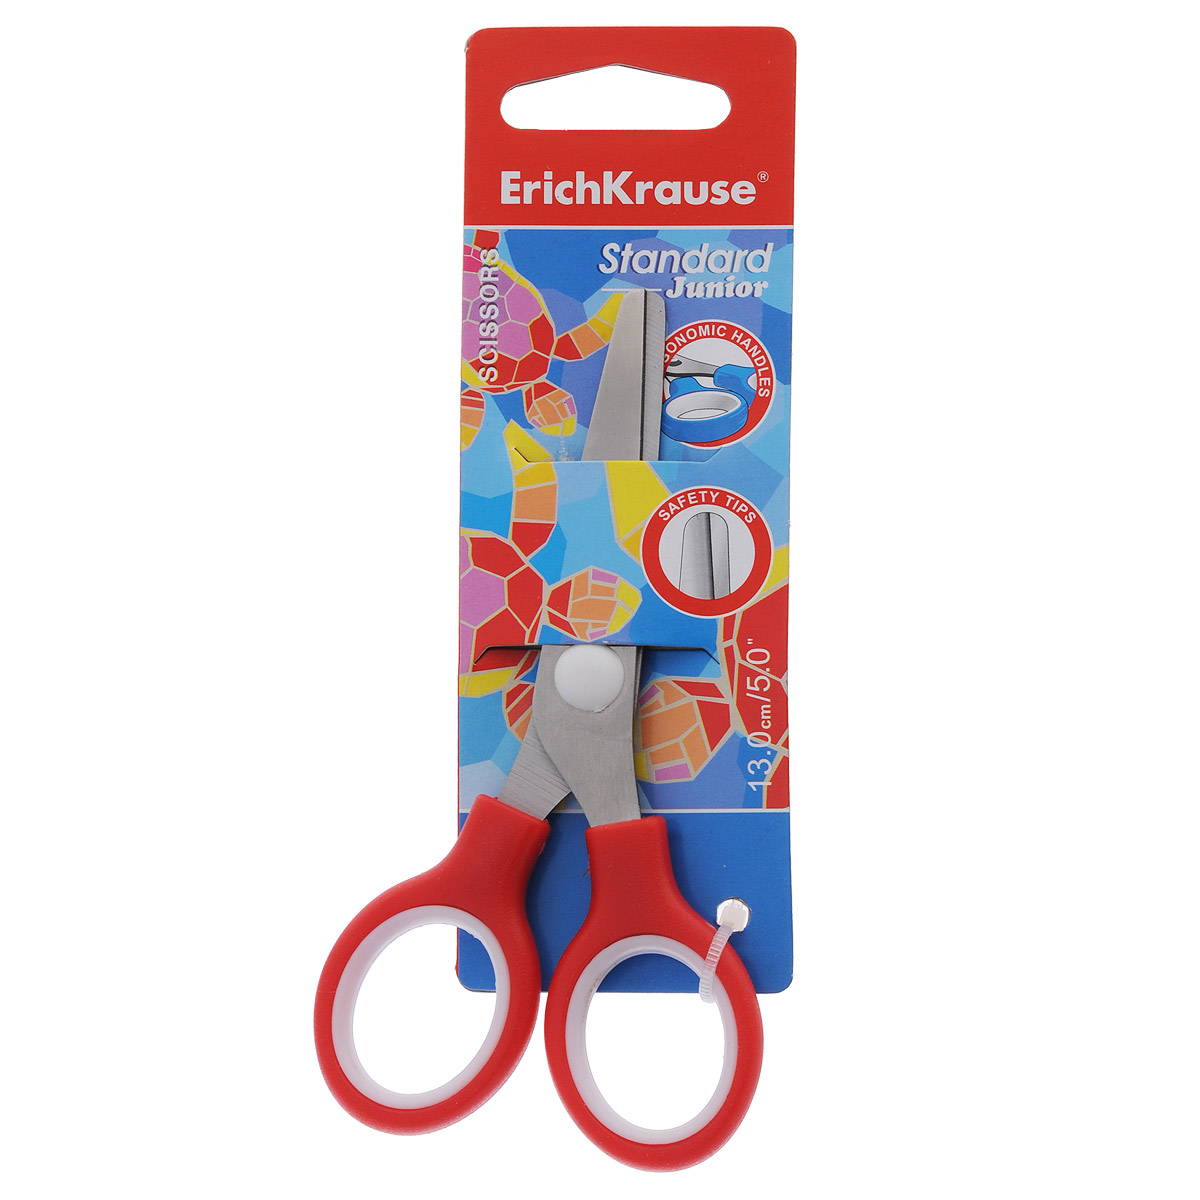 Ножницы Erich Krause Standard Junior, цвет: красный, 13 см ножницы erich krause ferro 15 см